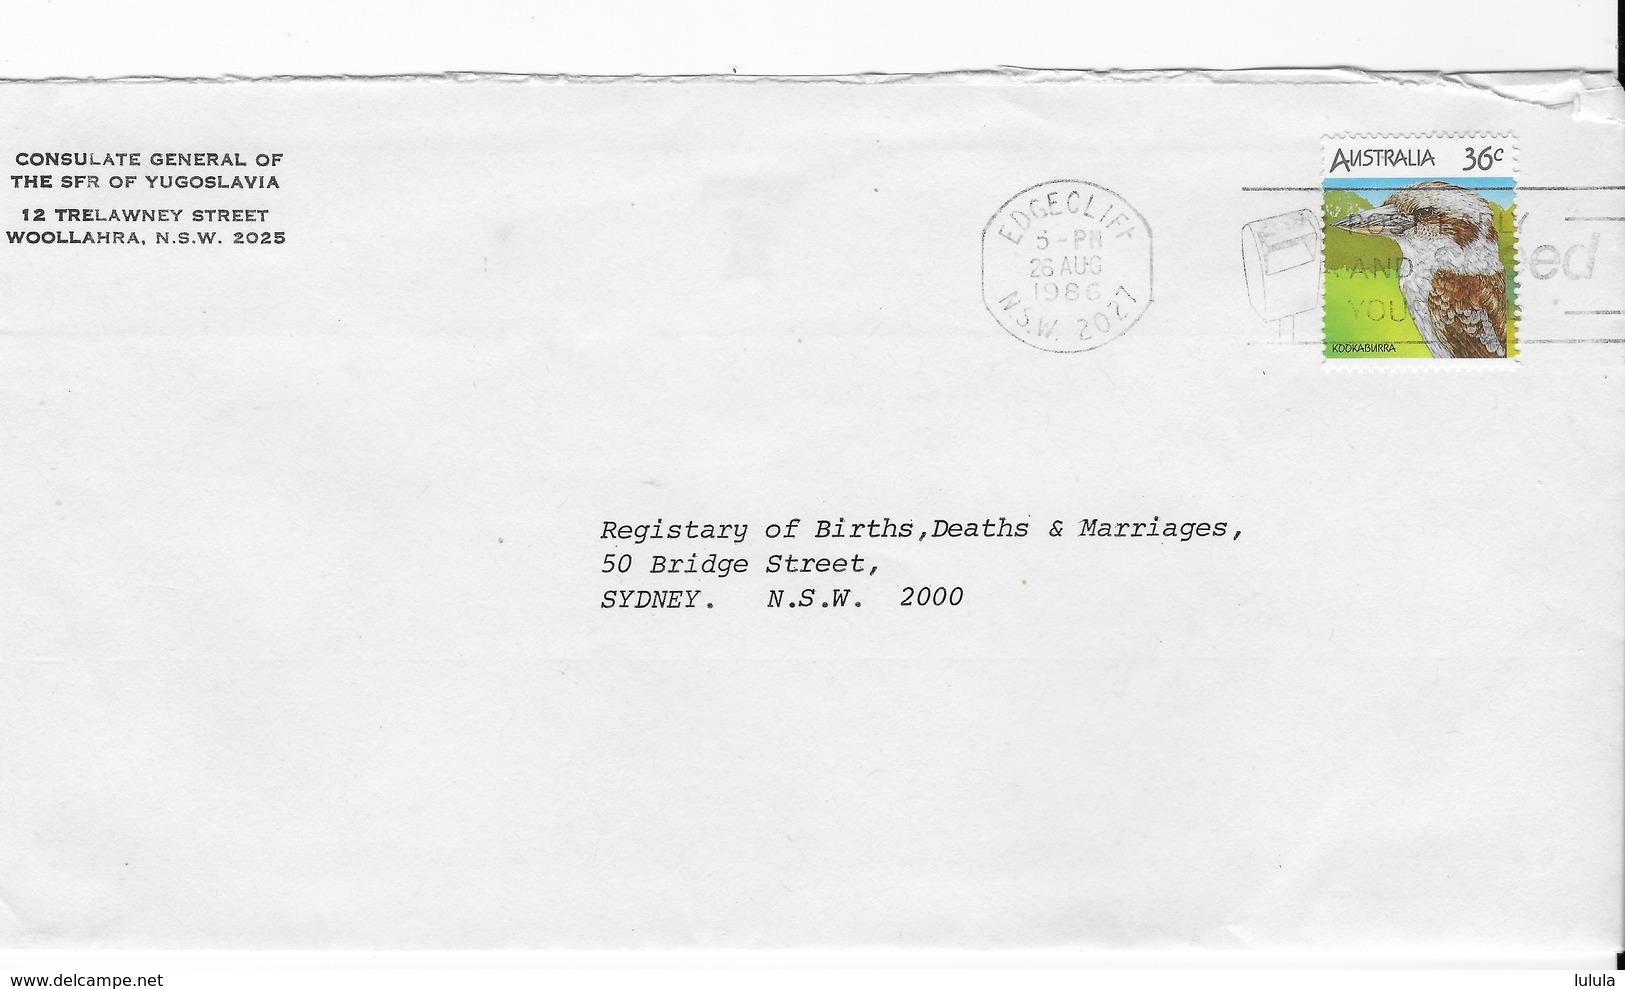 1986 Yugoslavia Socialist Federal Republic Consulate Commercial Cover Kookaburra Bird - 1980-89 Elizabeth II